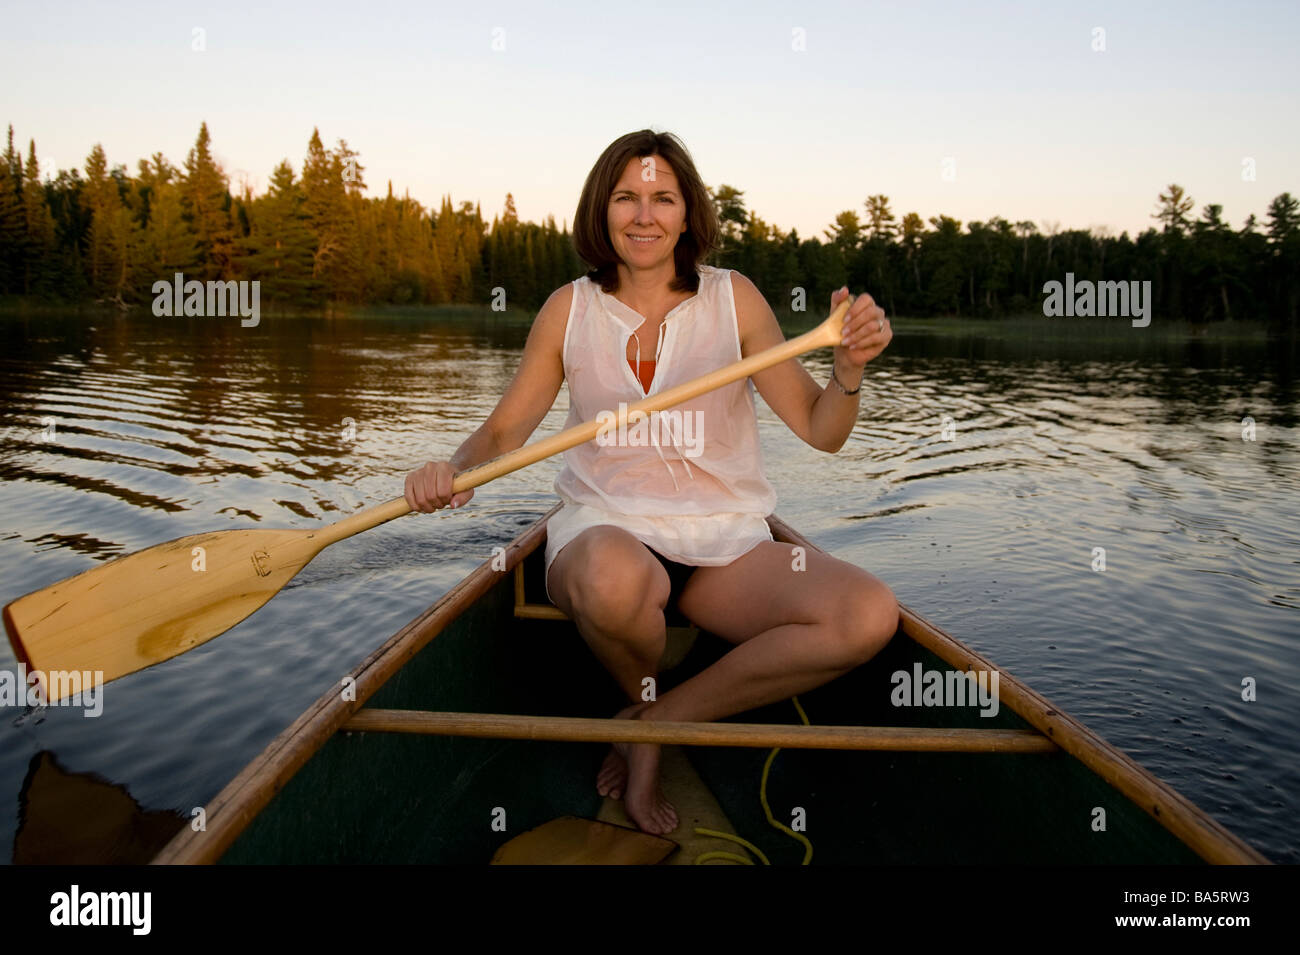 masha malinovskaya candid photos